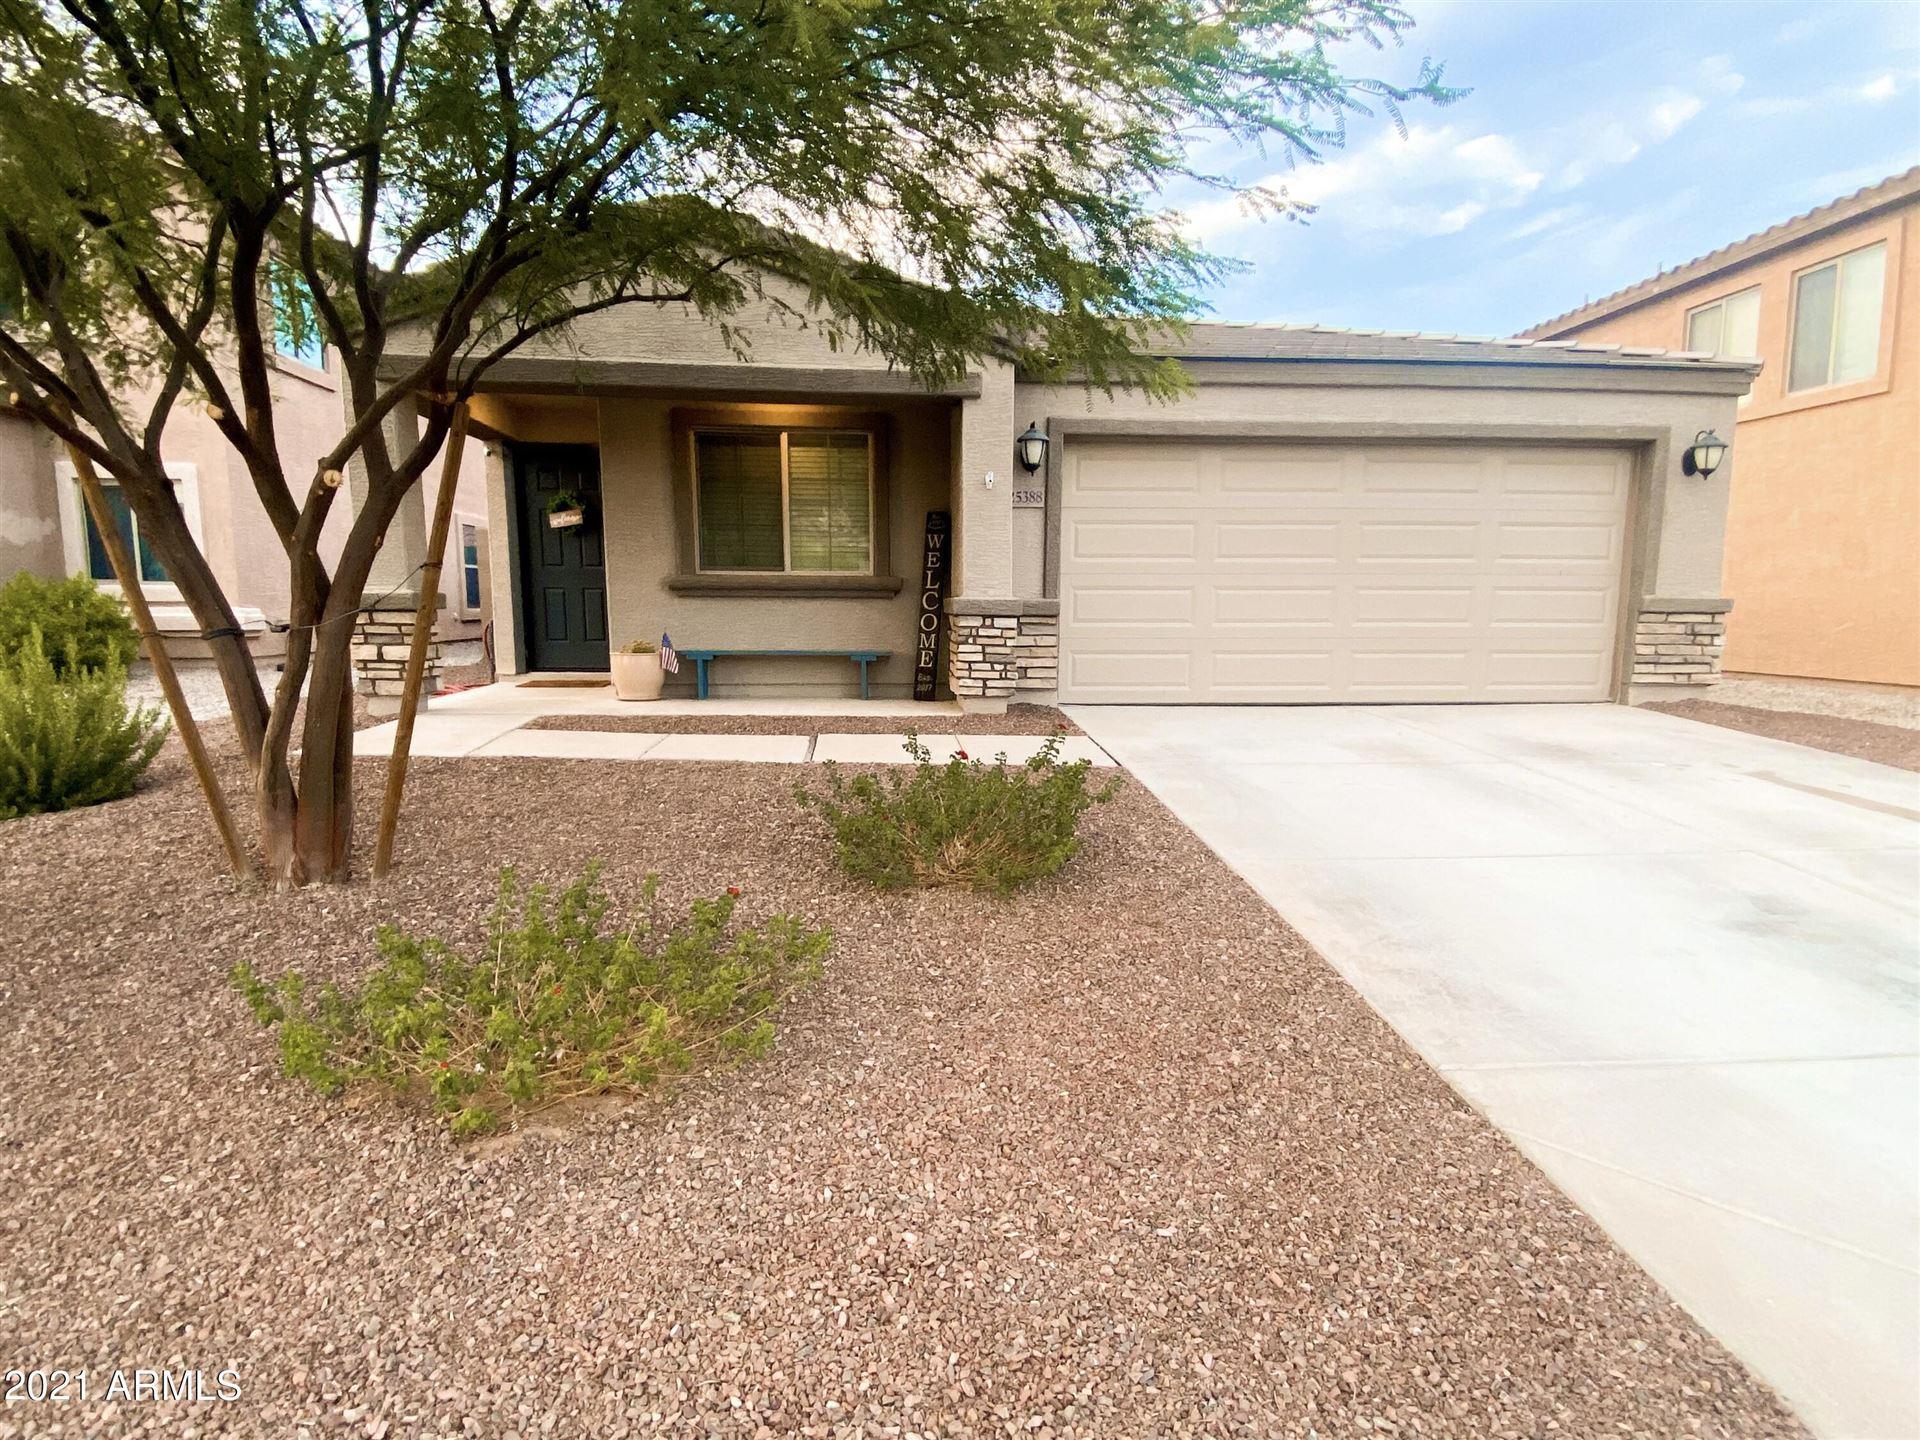 25388 W JACKSON Avenue, Buckeye, AZ 85326 - MLS#: 6268641